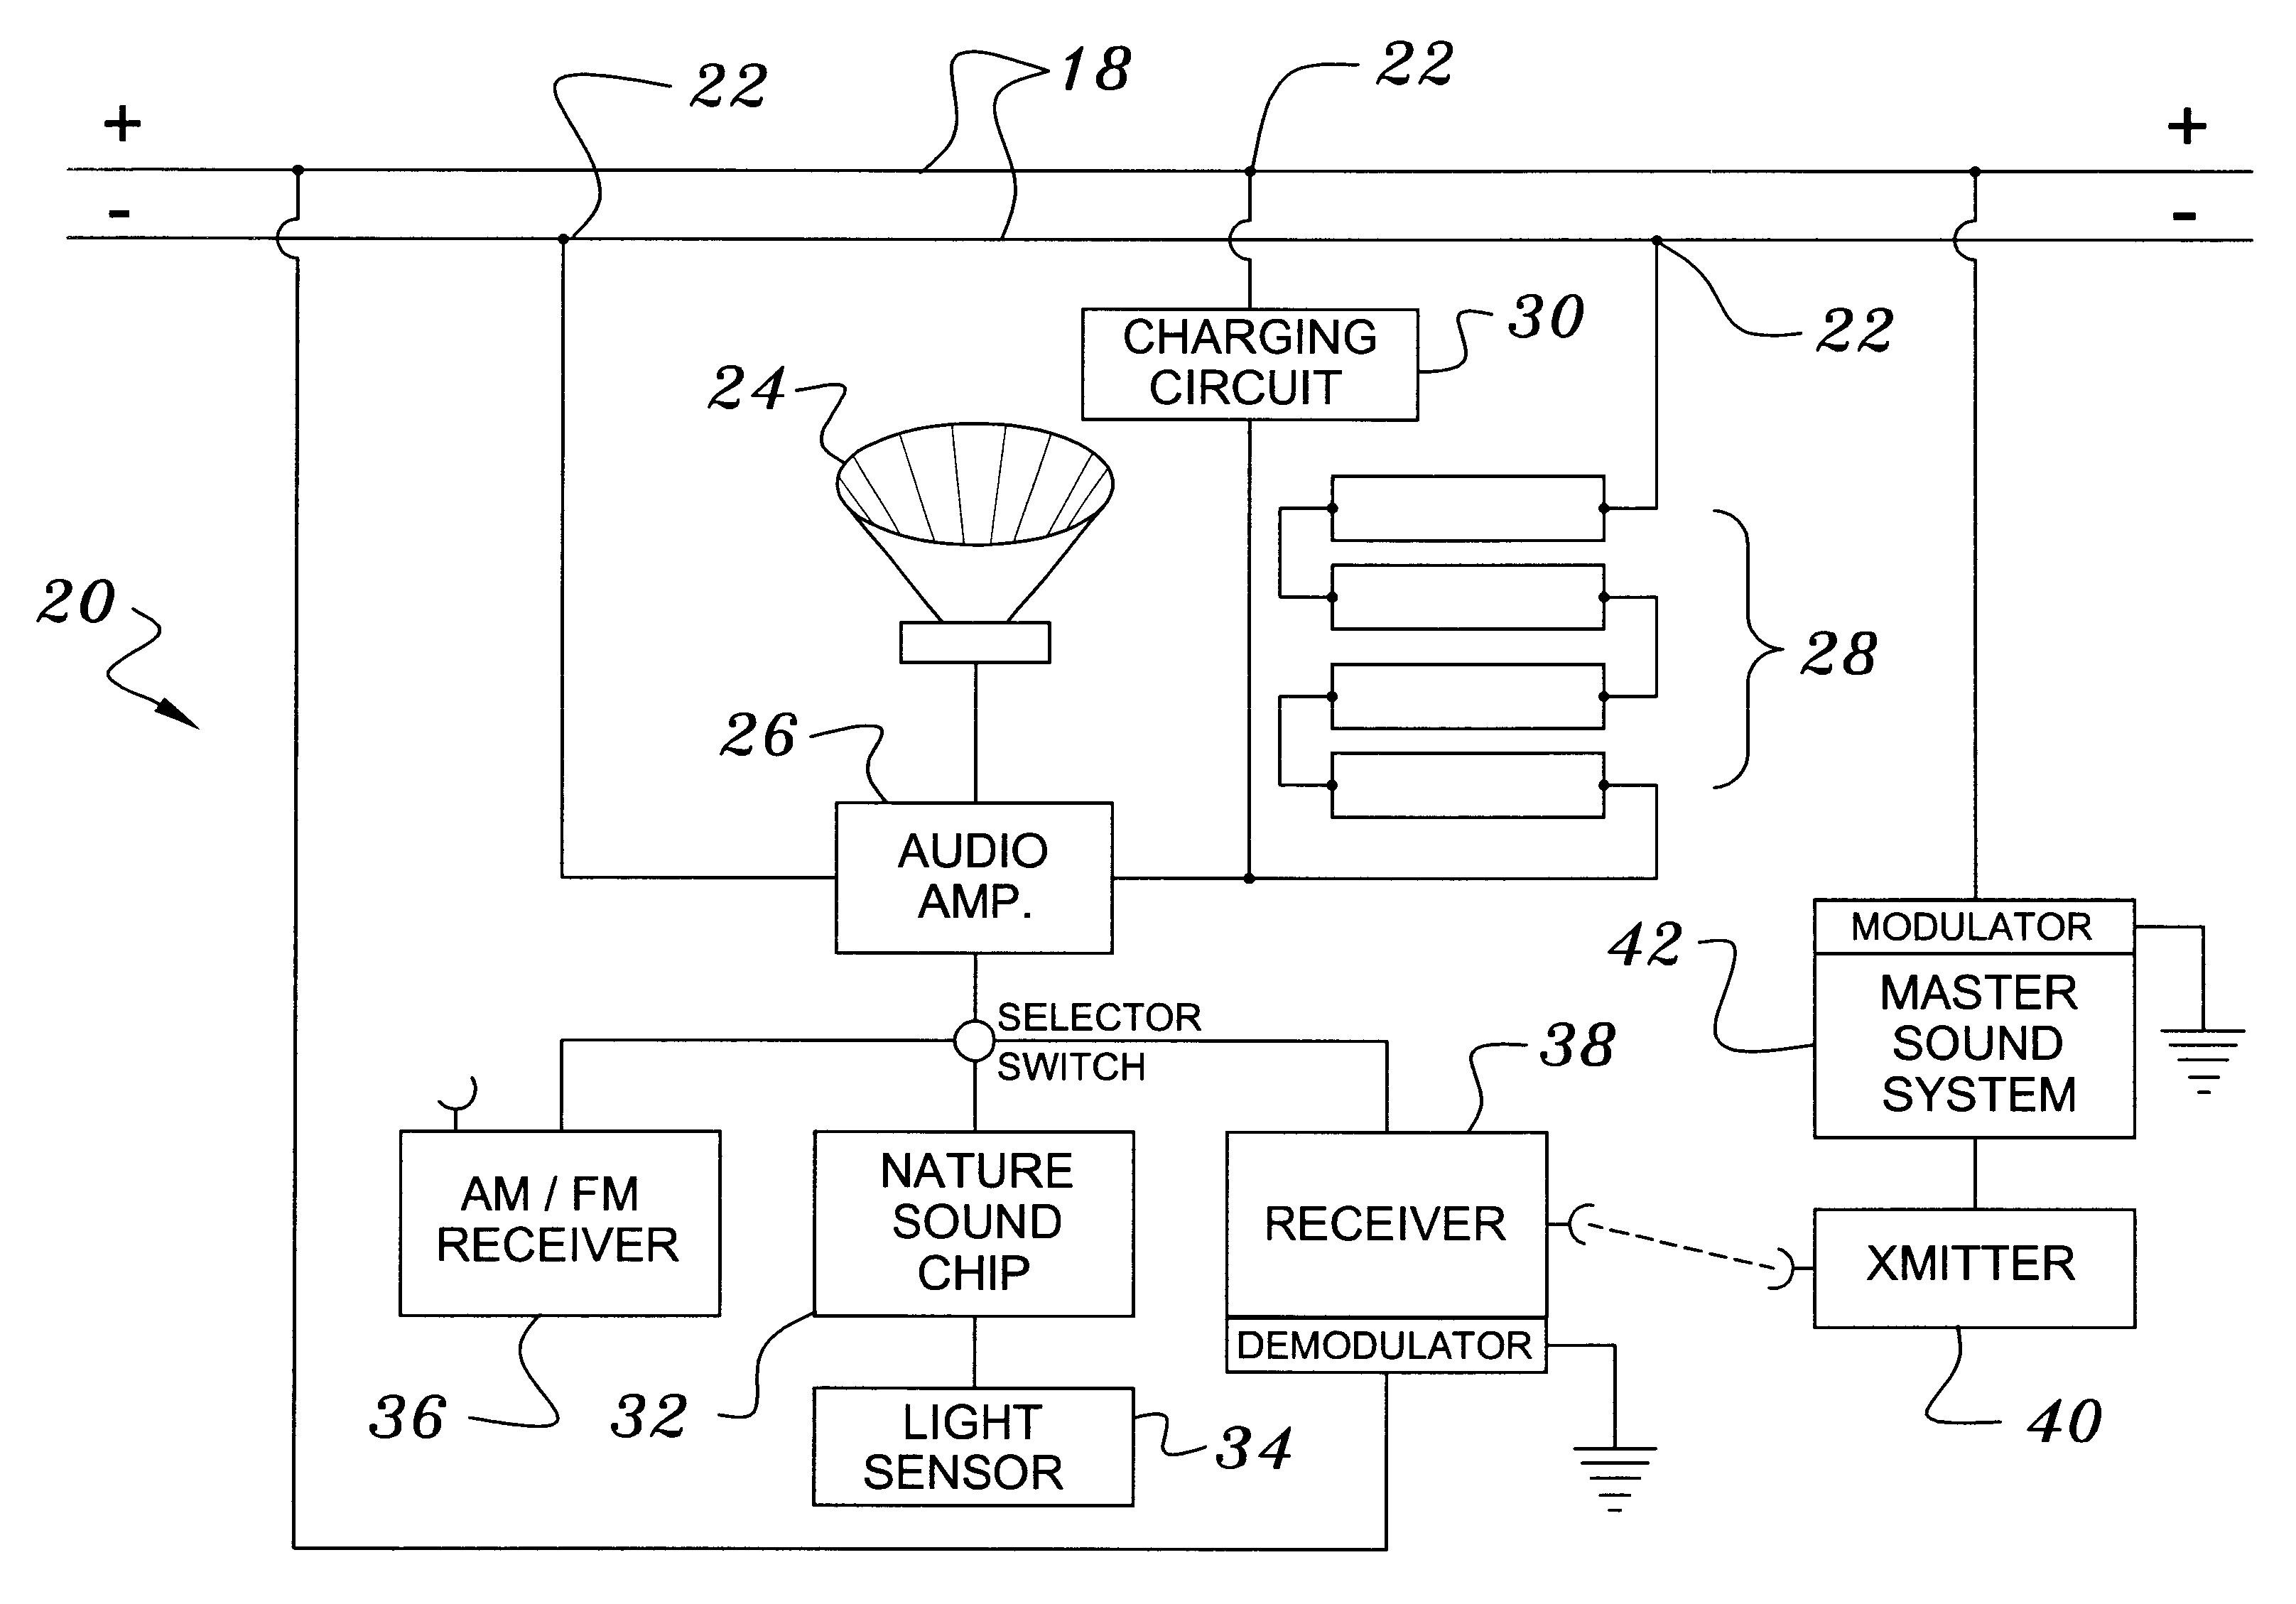 Ac Low Voltage Wiring Diagram Wiring Installation Coastal source Readingrat Net and Low Voltage Of Ac Low Voltage Wiring Diagram